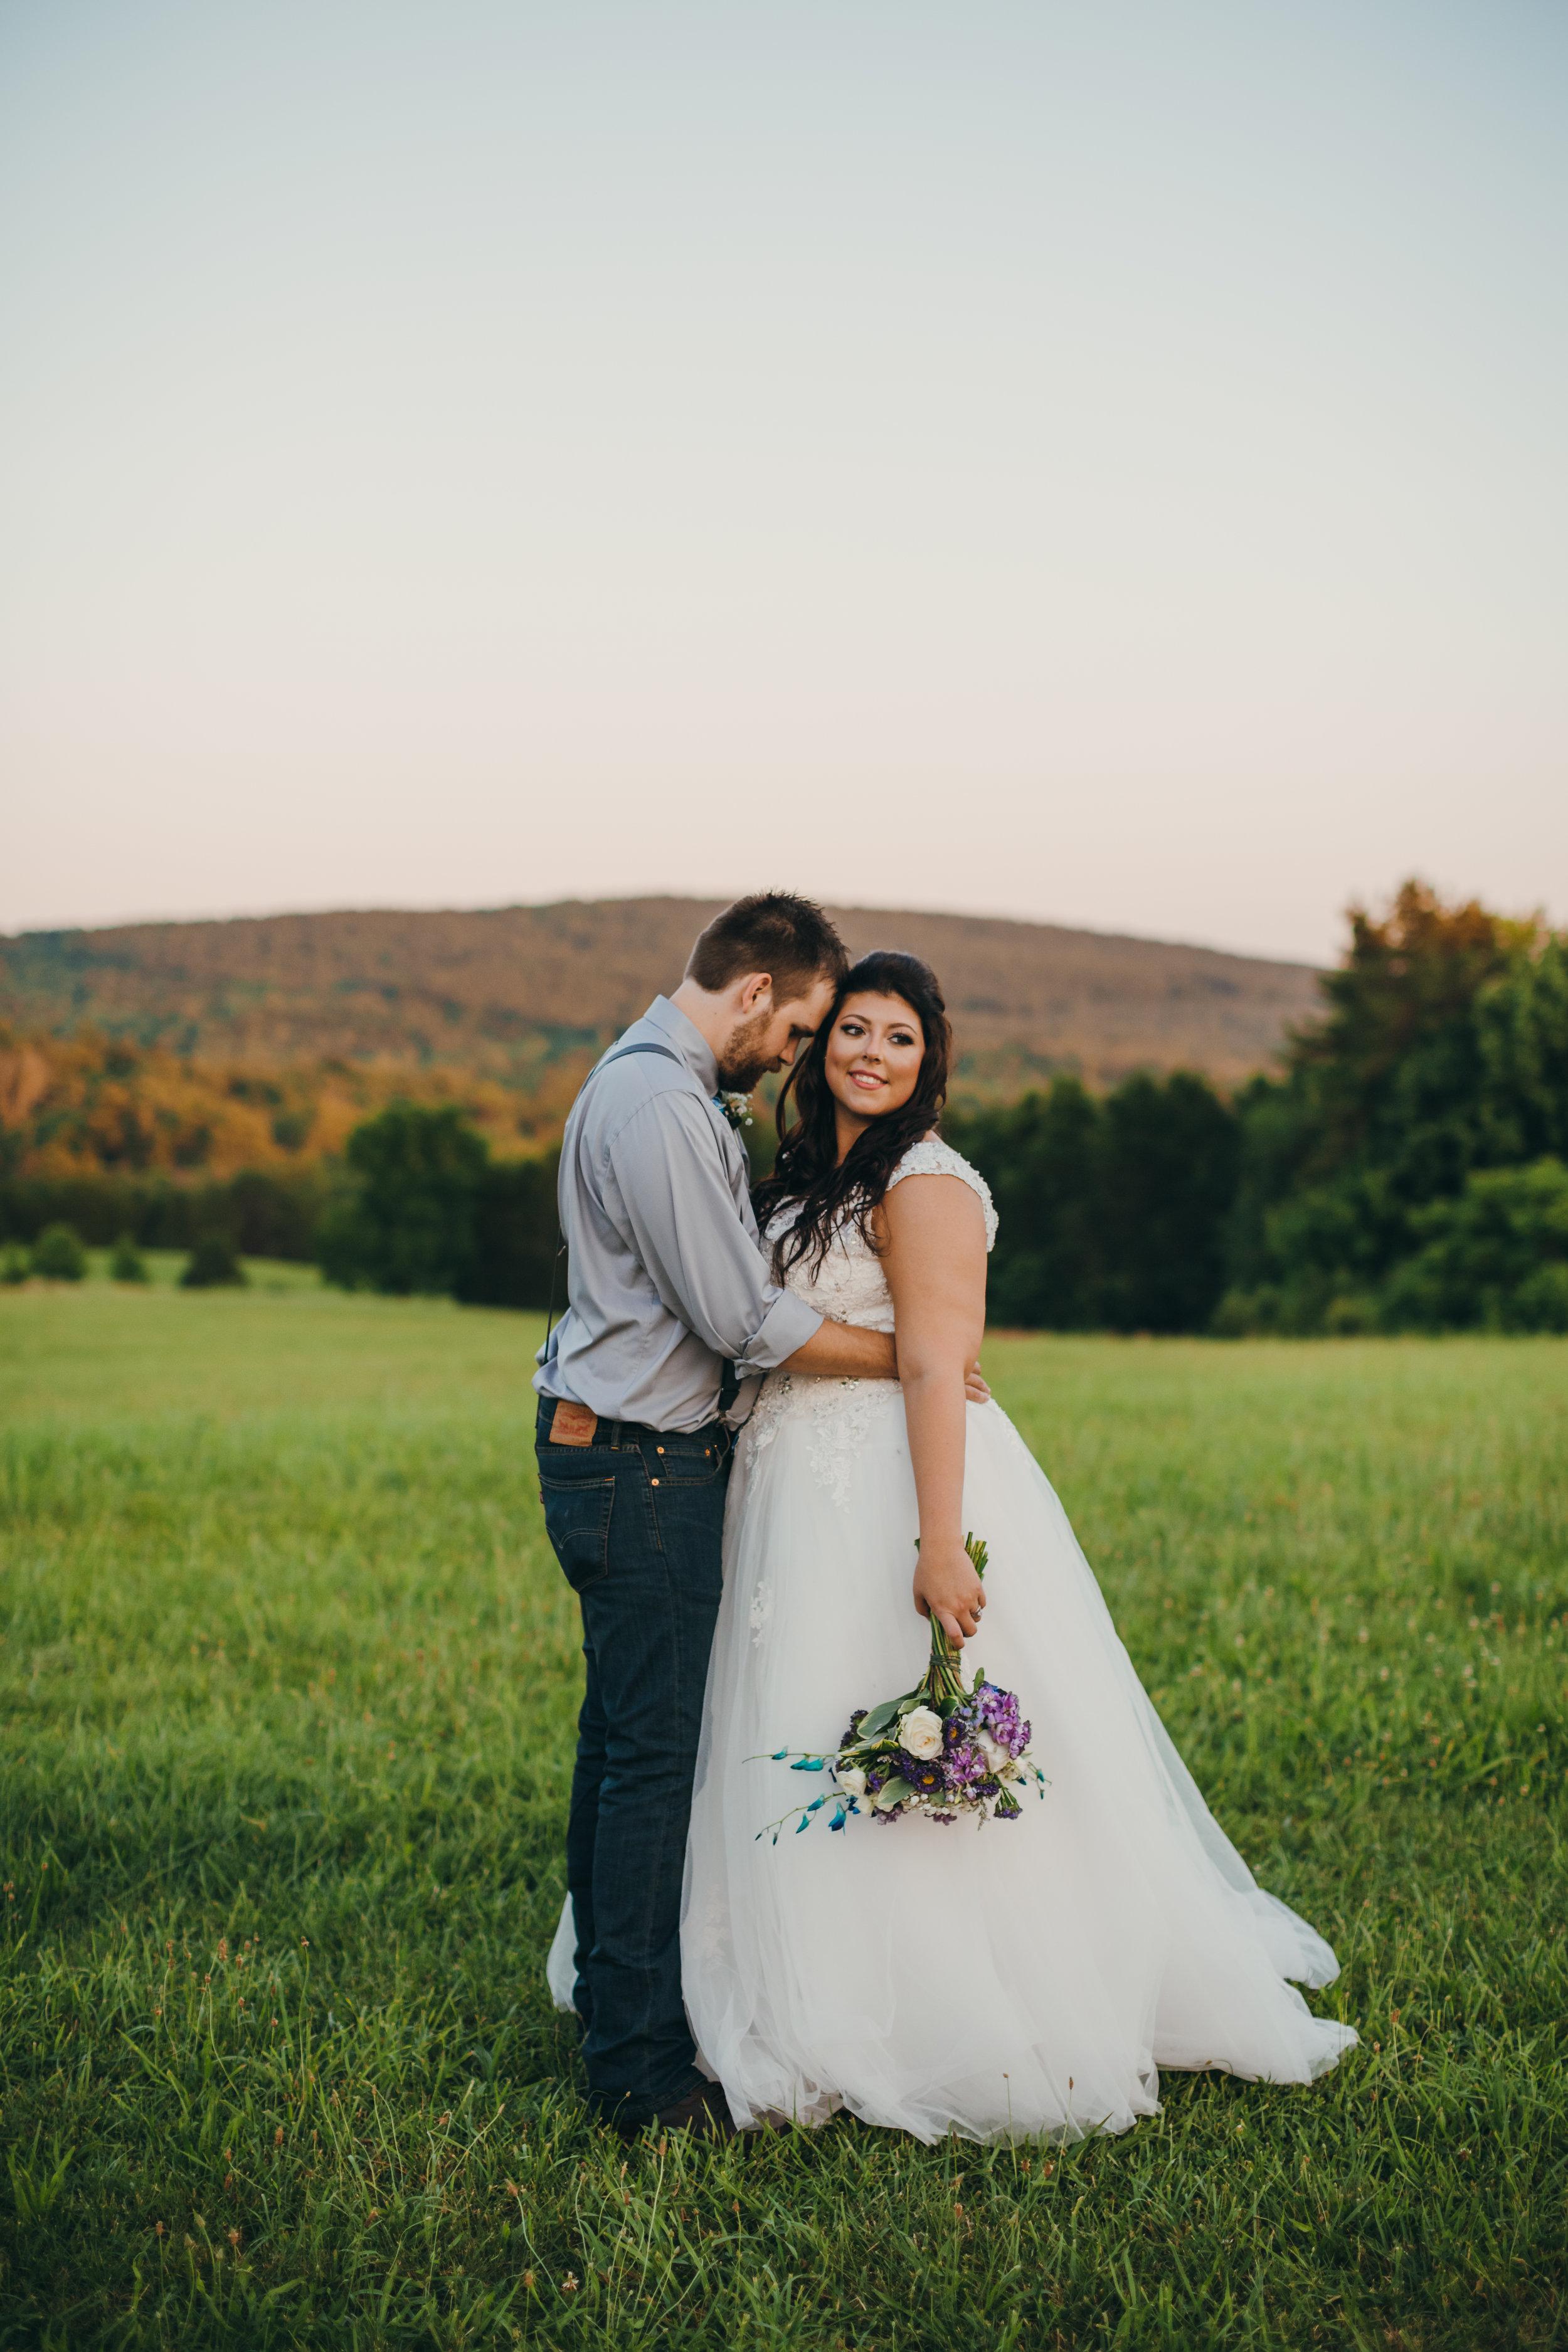 Sorella Farms_Lynchburg Wedding Photographer_Lynchburg Wedding Venue_Lynchburg Photographer-40.jpg